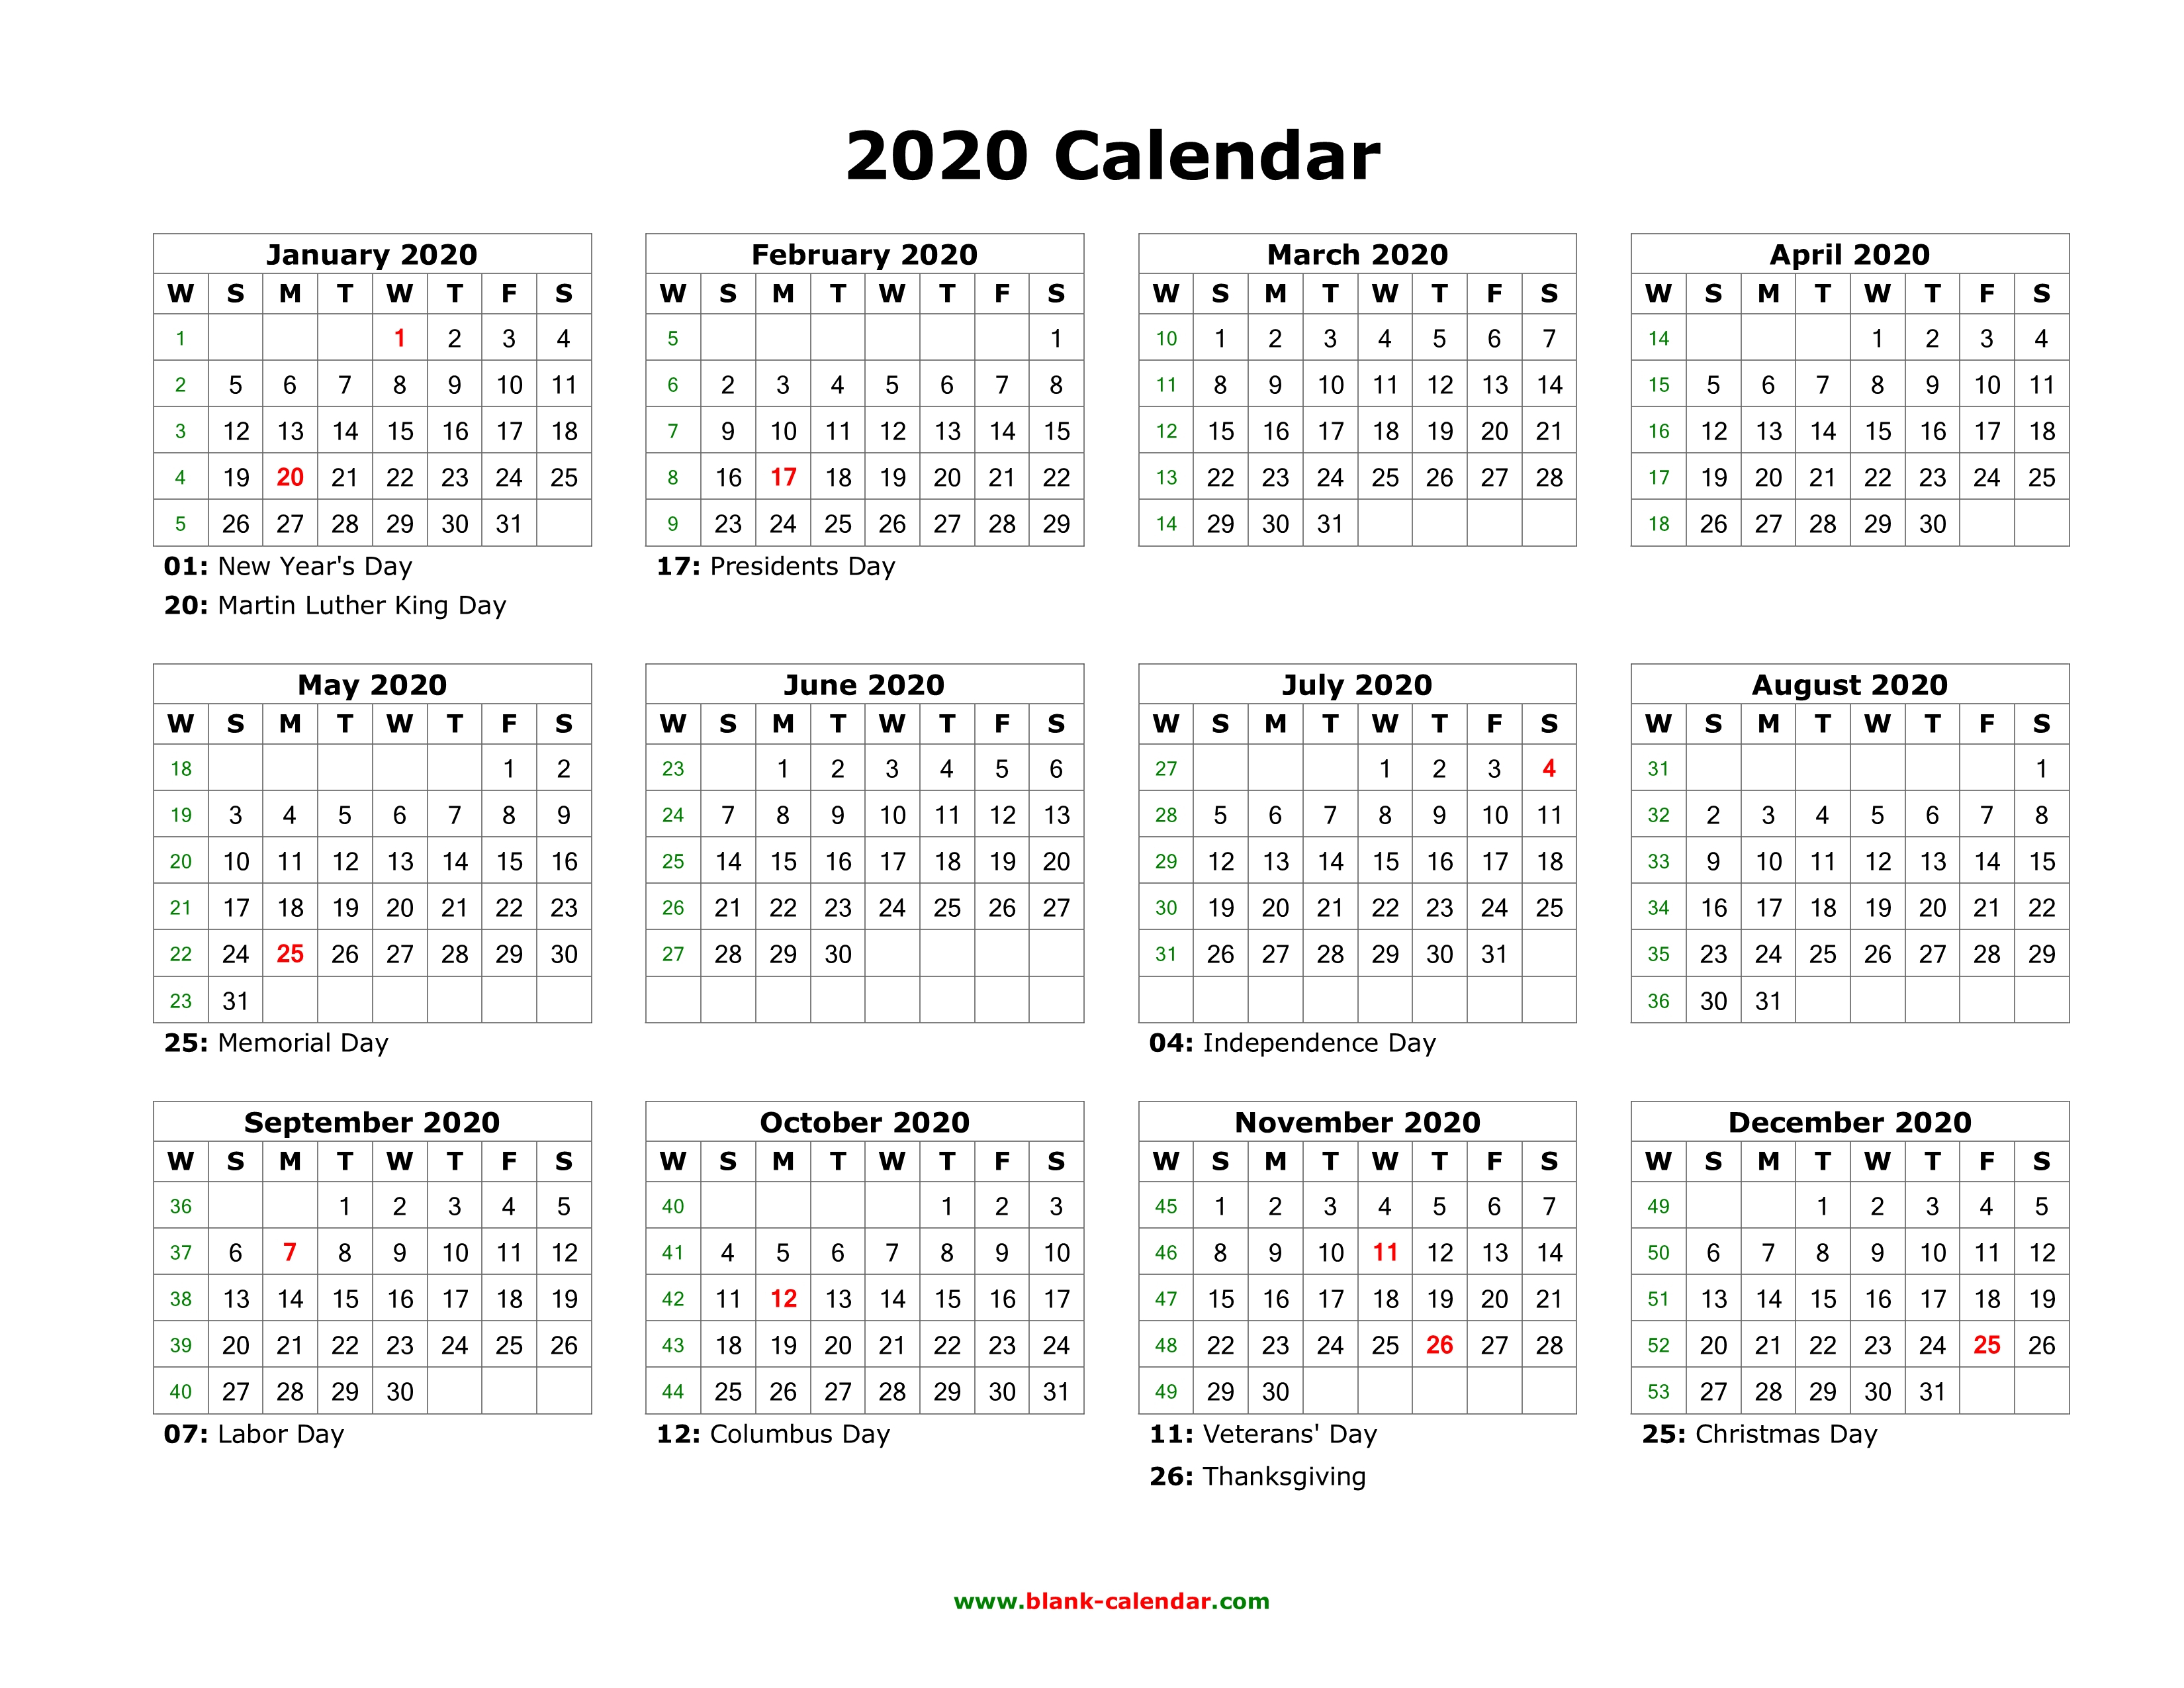 12 Month Calendar Printable 2020 - Wpa.wpart.co with 2020 Calendar Free Printable